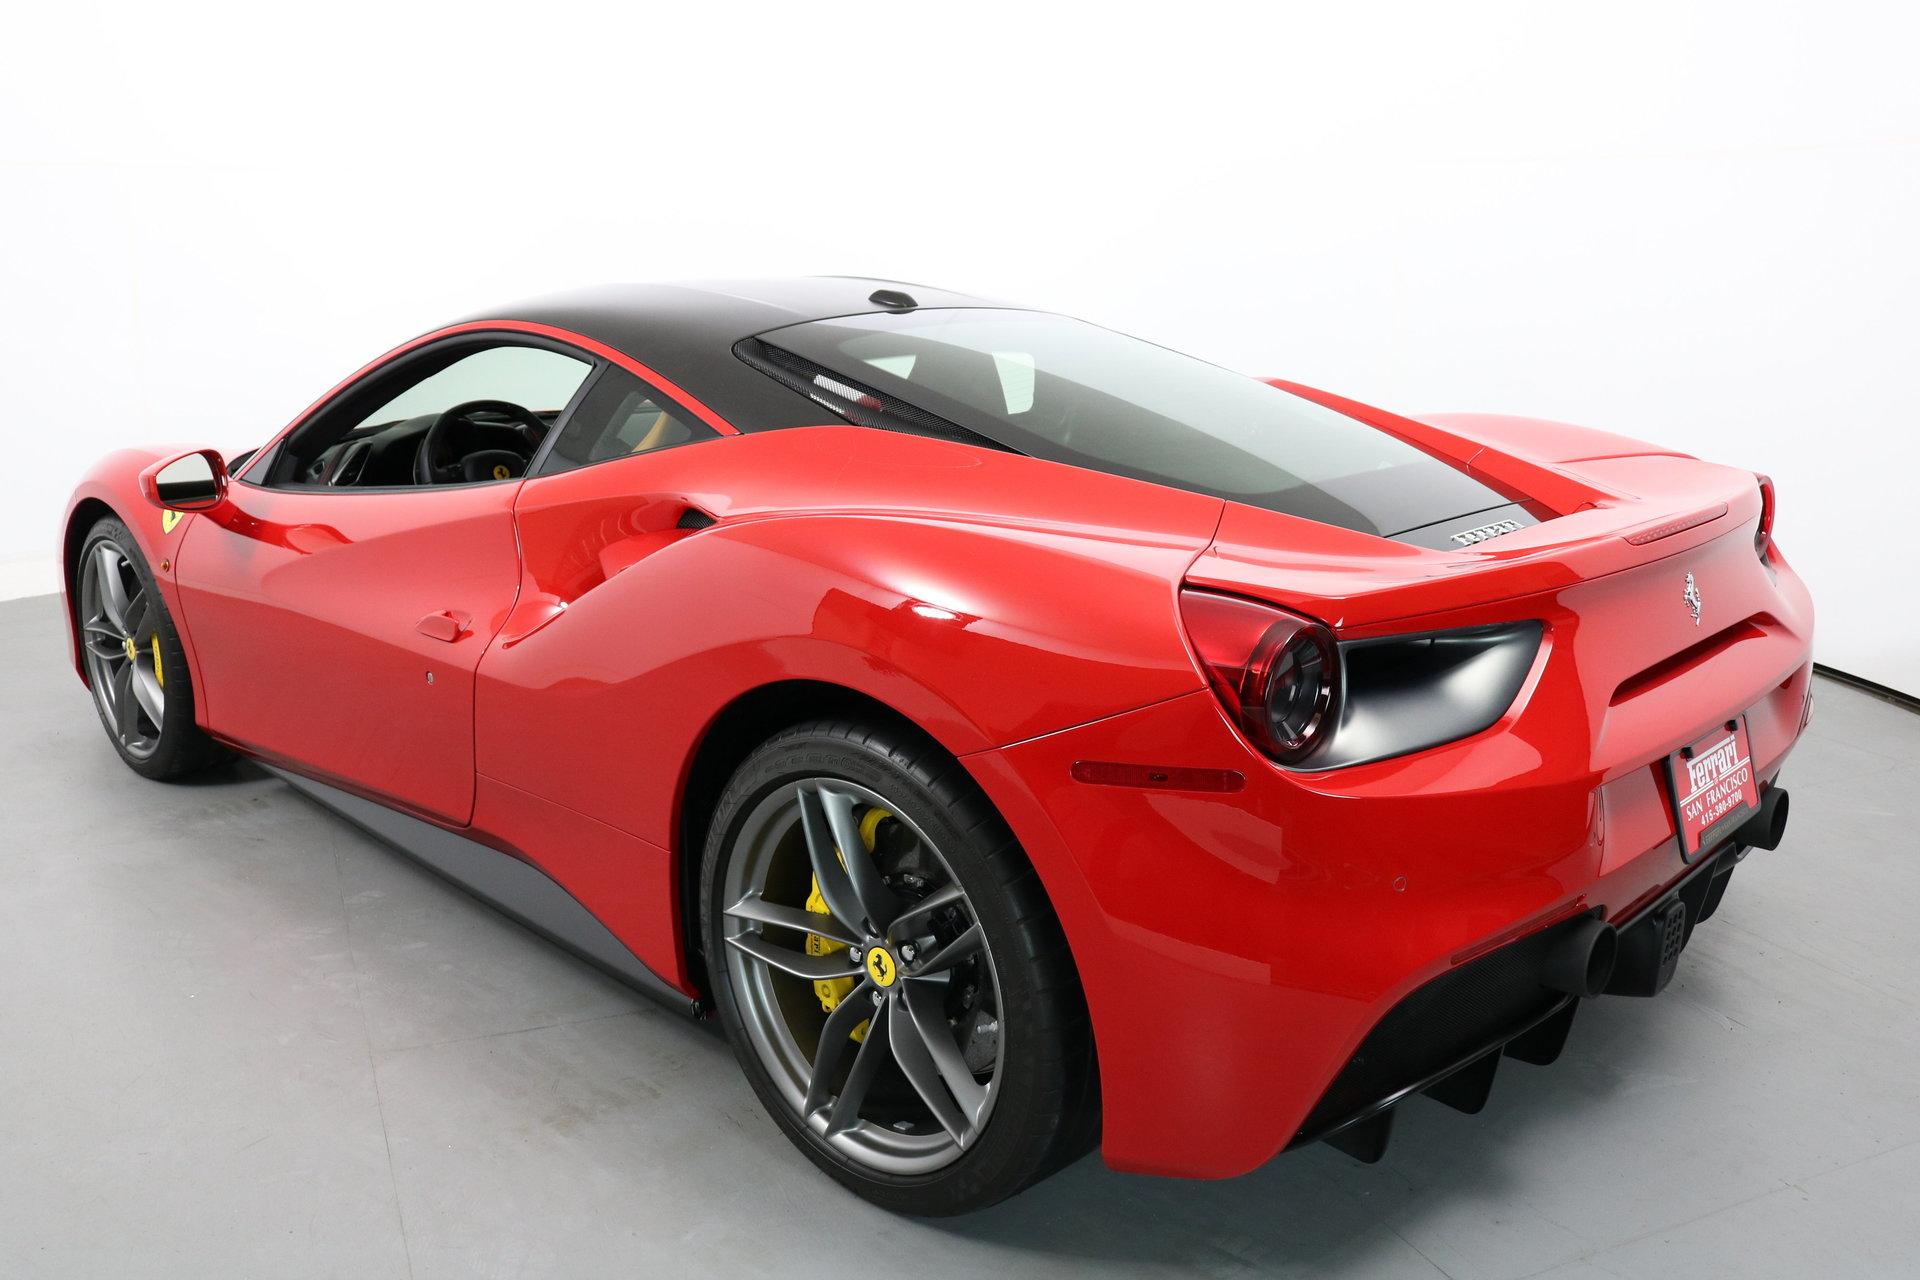 For Sale 65 Corsa Convertible Rolling Chassis California: 2017 Ferrari 488 GTB For Sale #88582